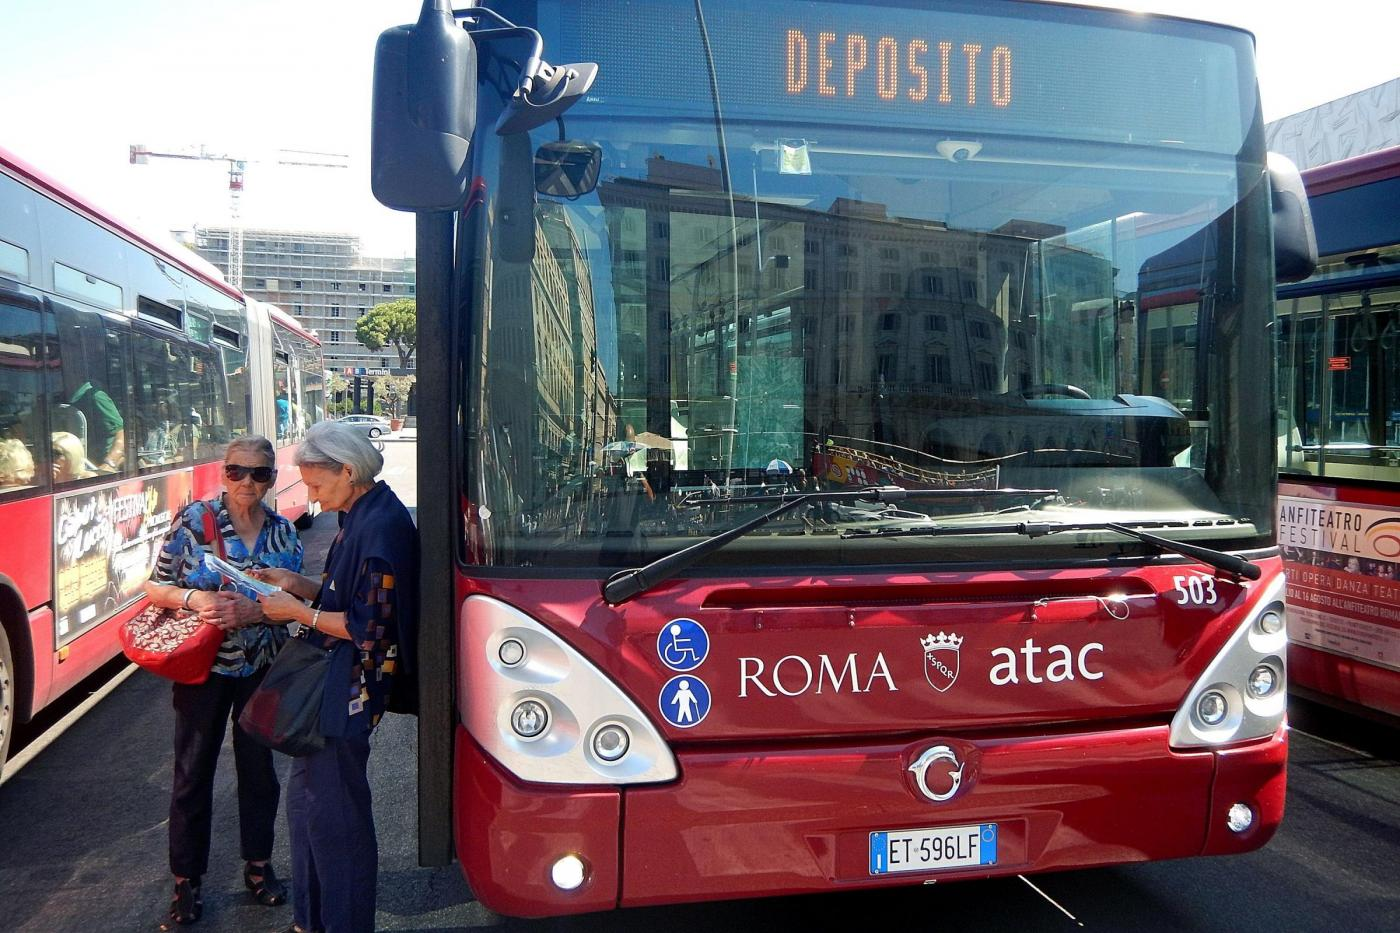 Atac di Roma, multa ai sindacati: dovranno restituire 400 mila euro